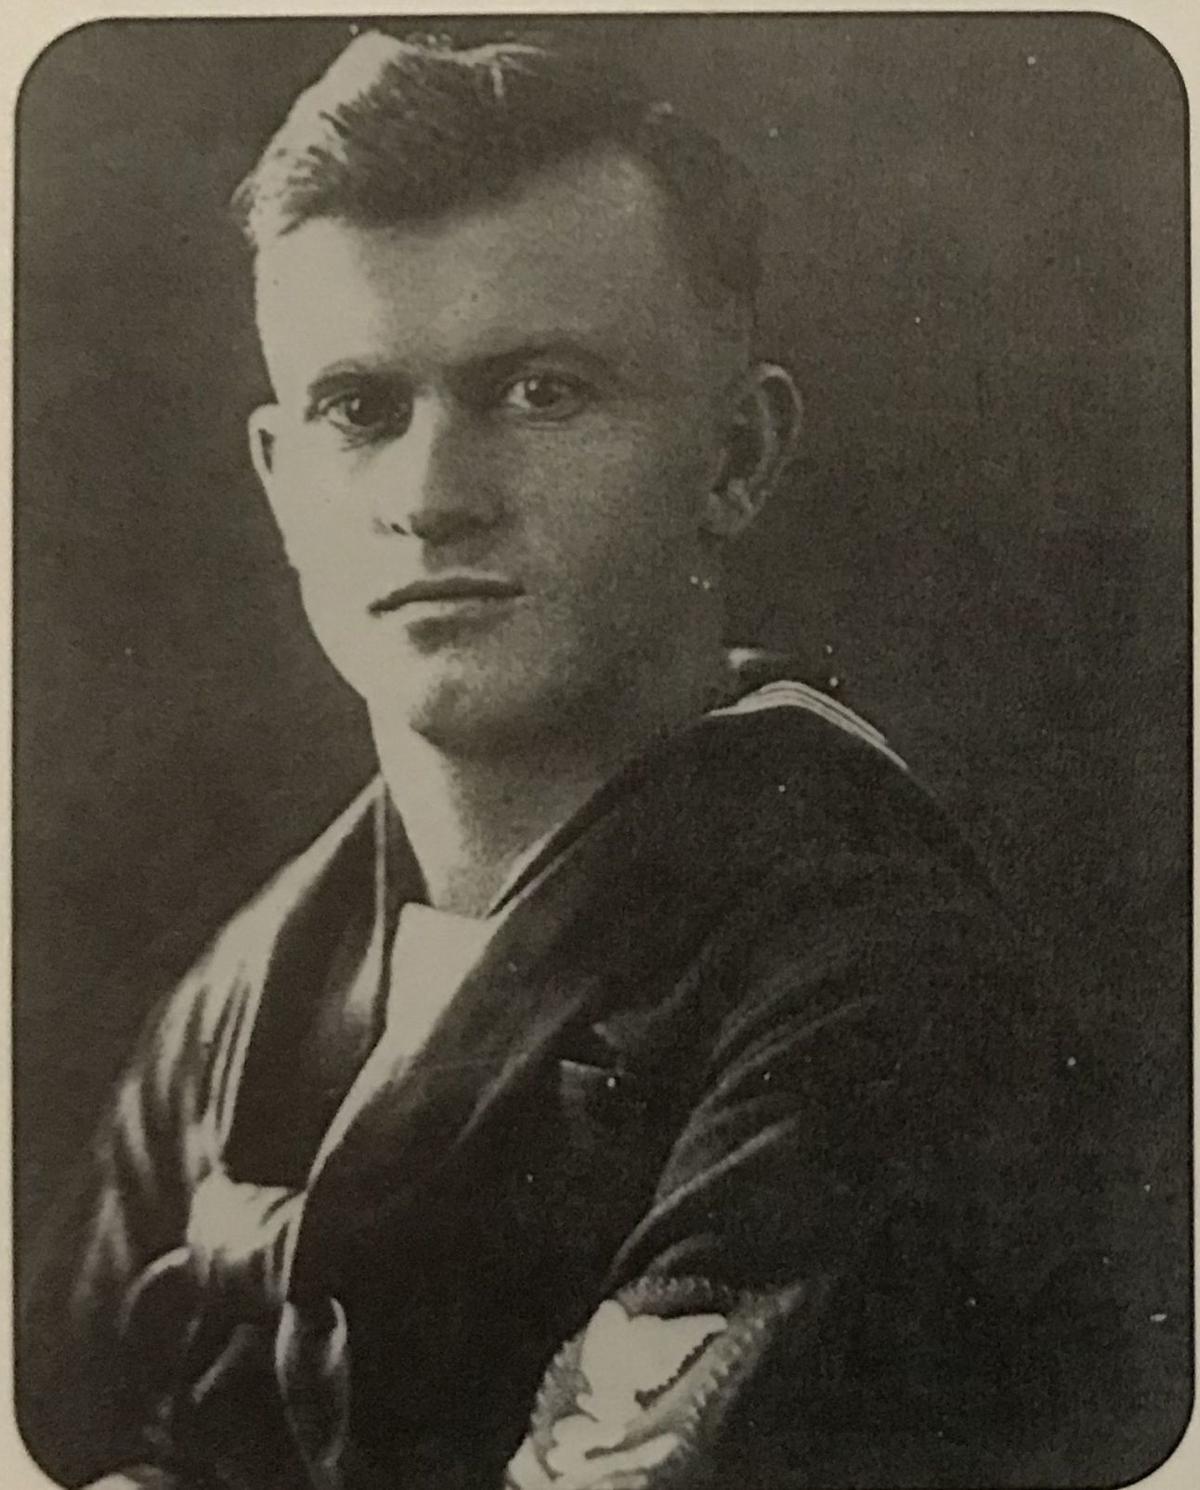 John Novacek